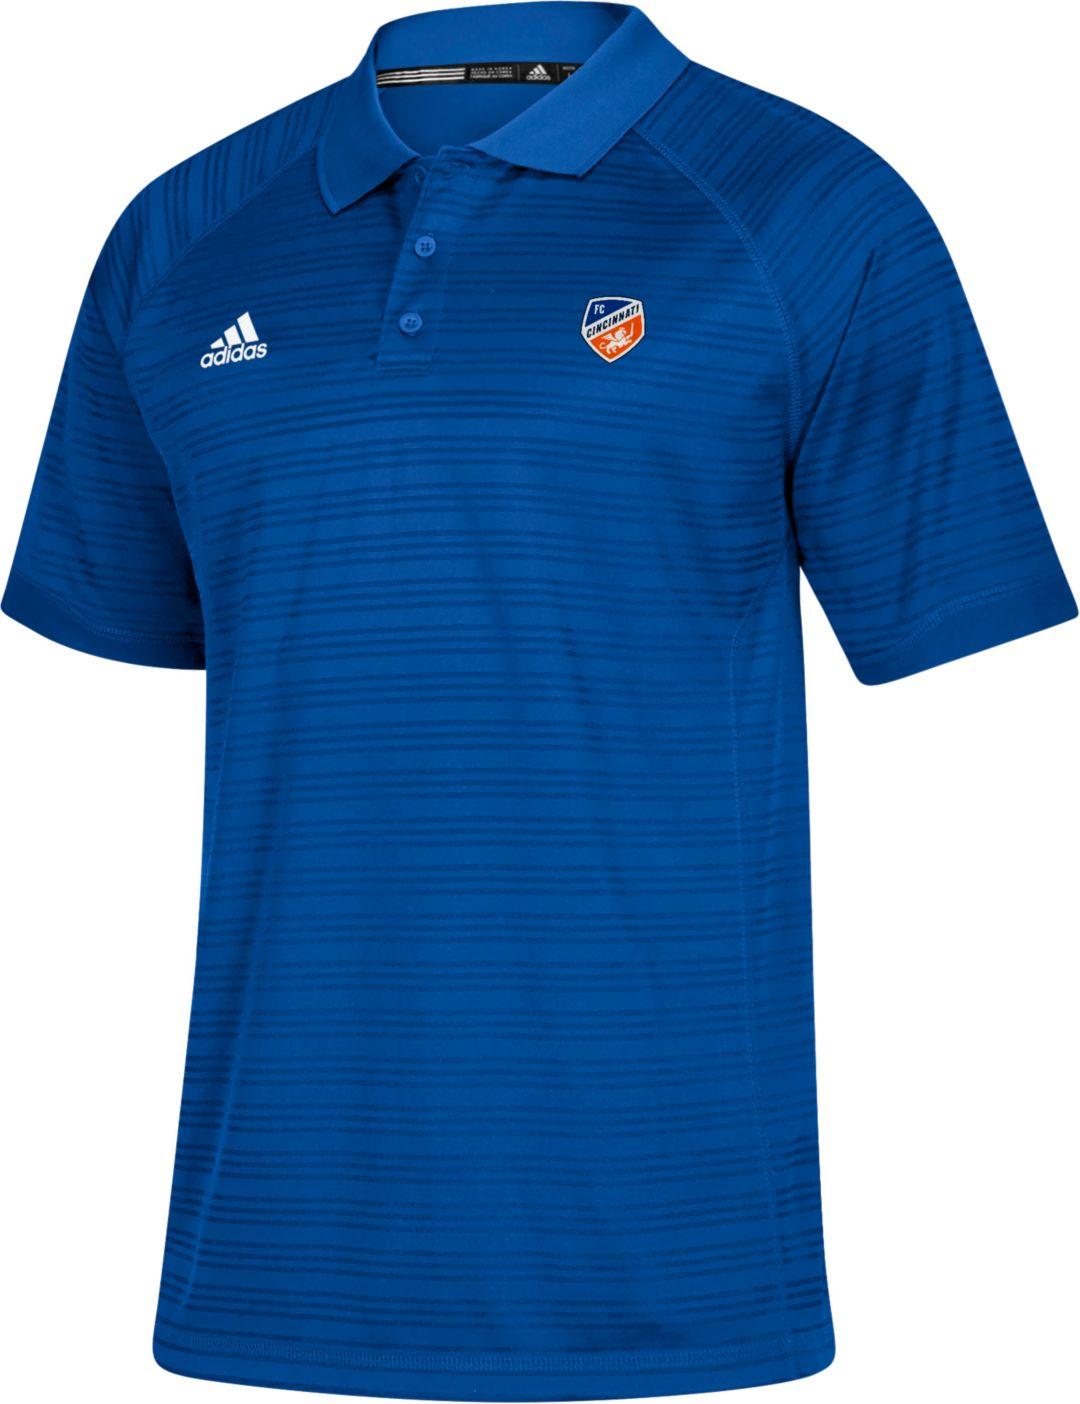 new style 1d073 8987b adidas Men's FC Cincinnati Crest Blue Polo